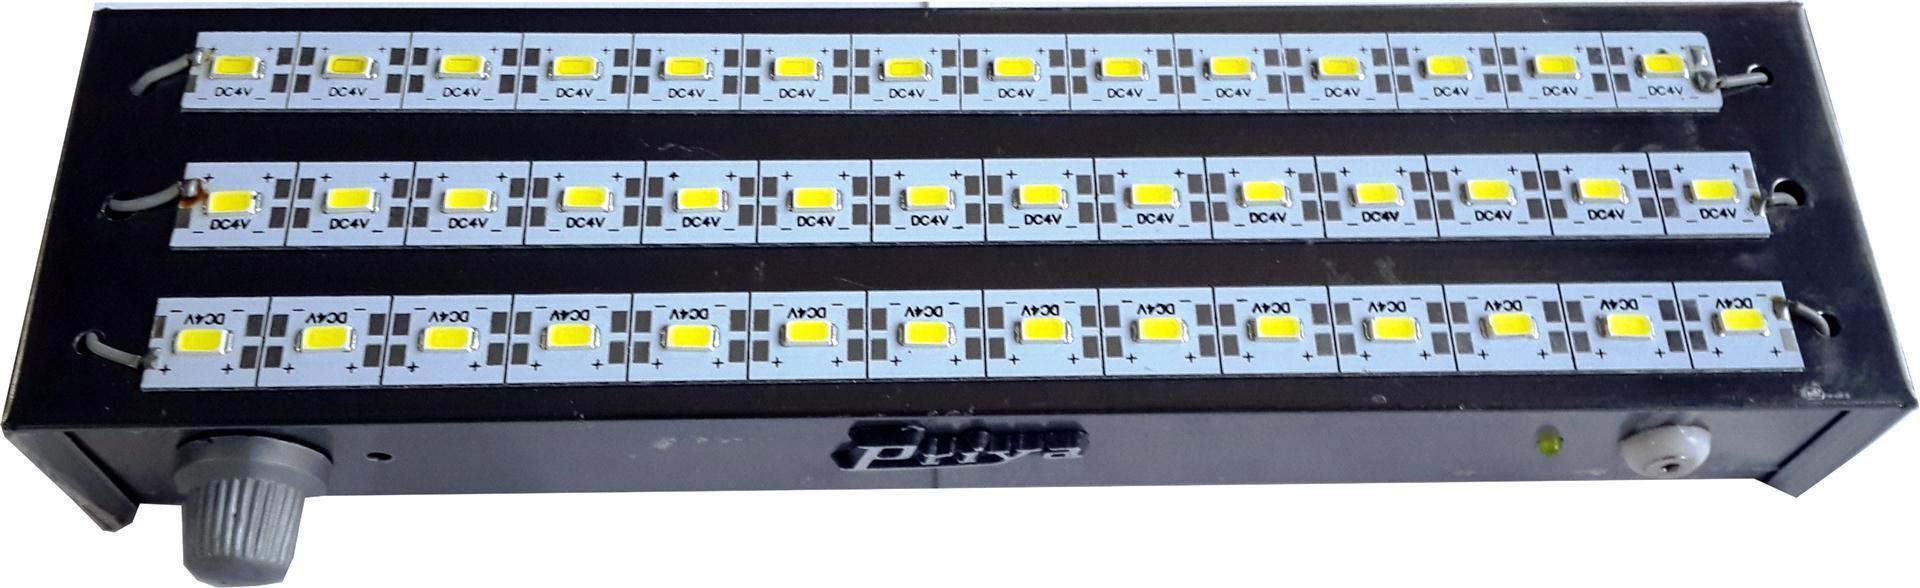 View AIW Priya 2 MPR Emergency Lights(Silver) Home Appliances Price Online(AIW)